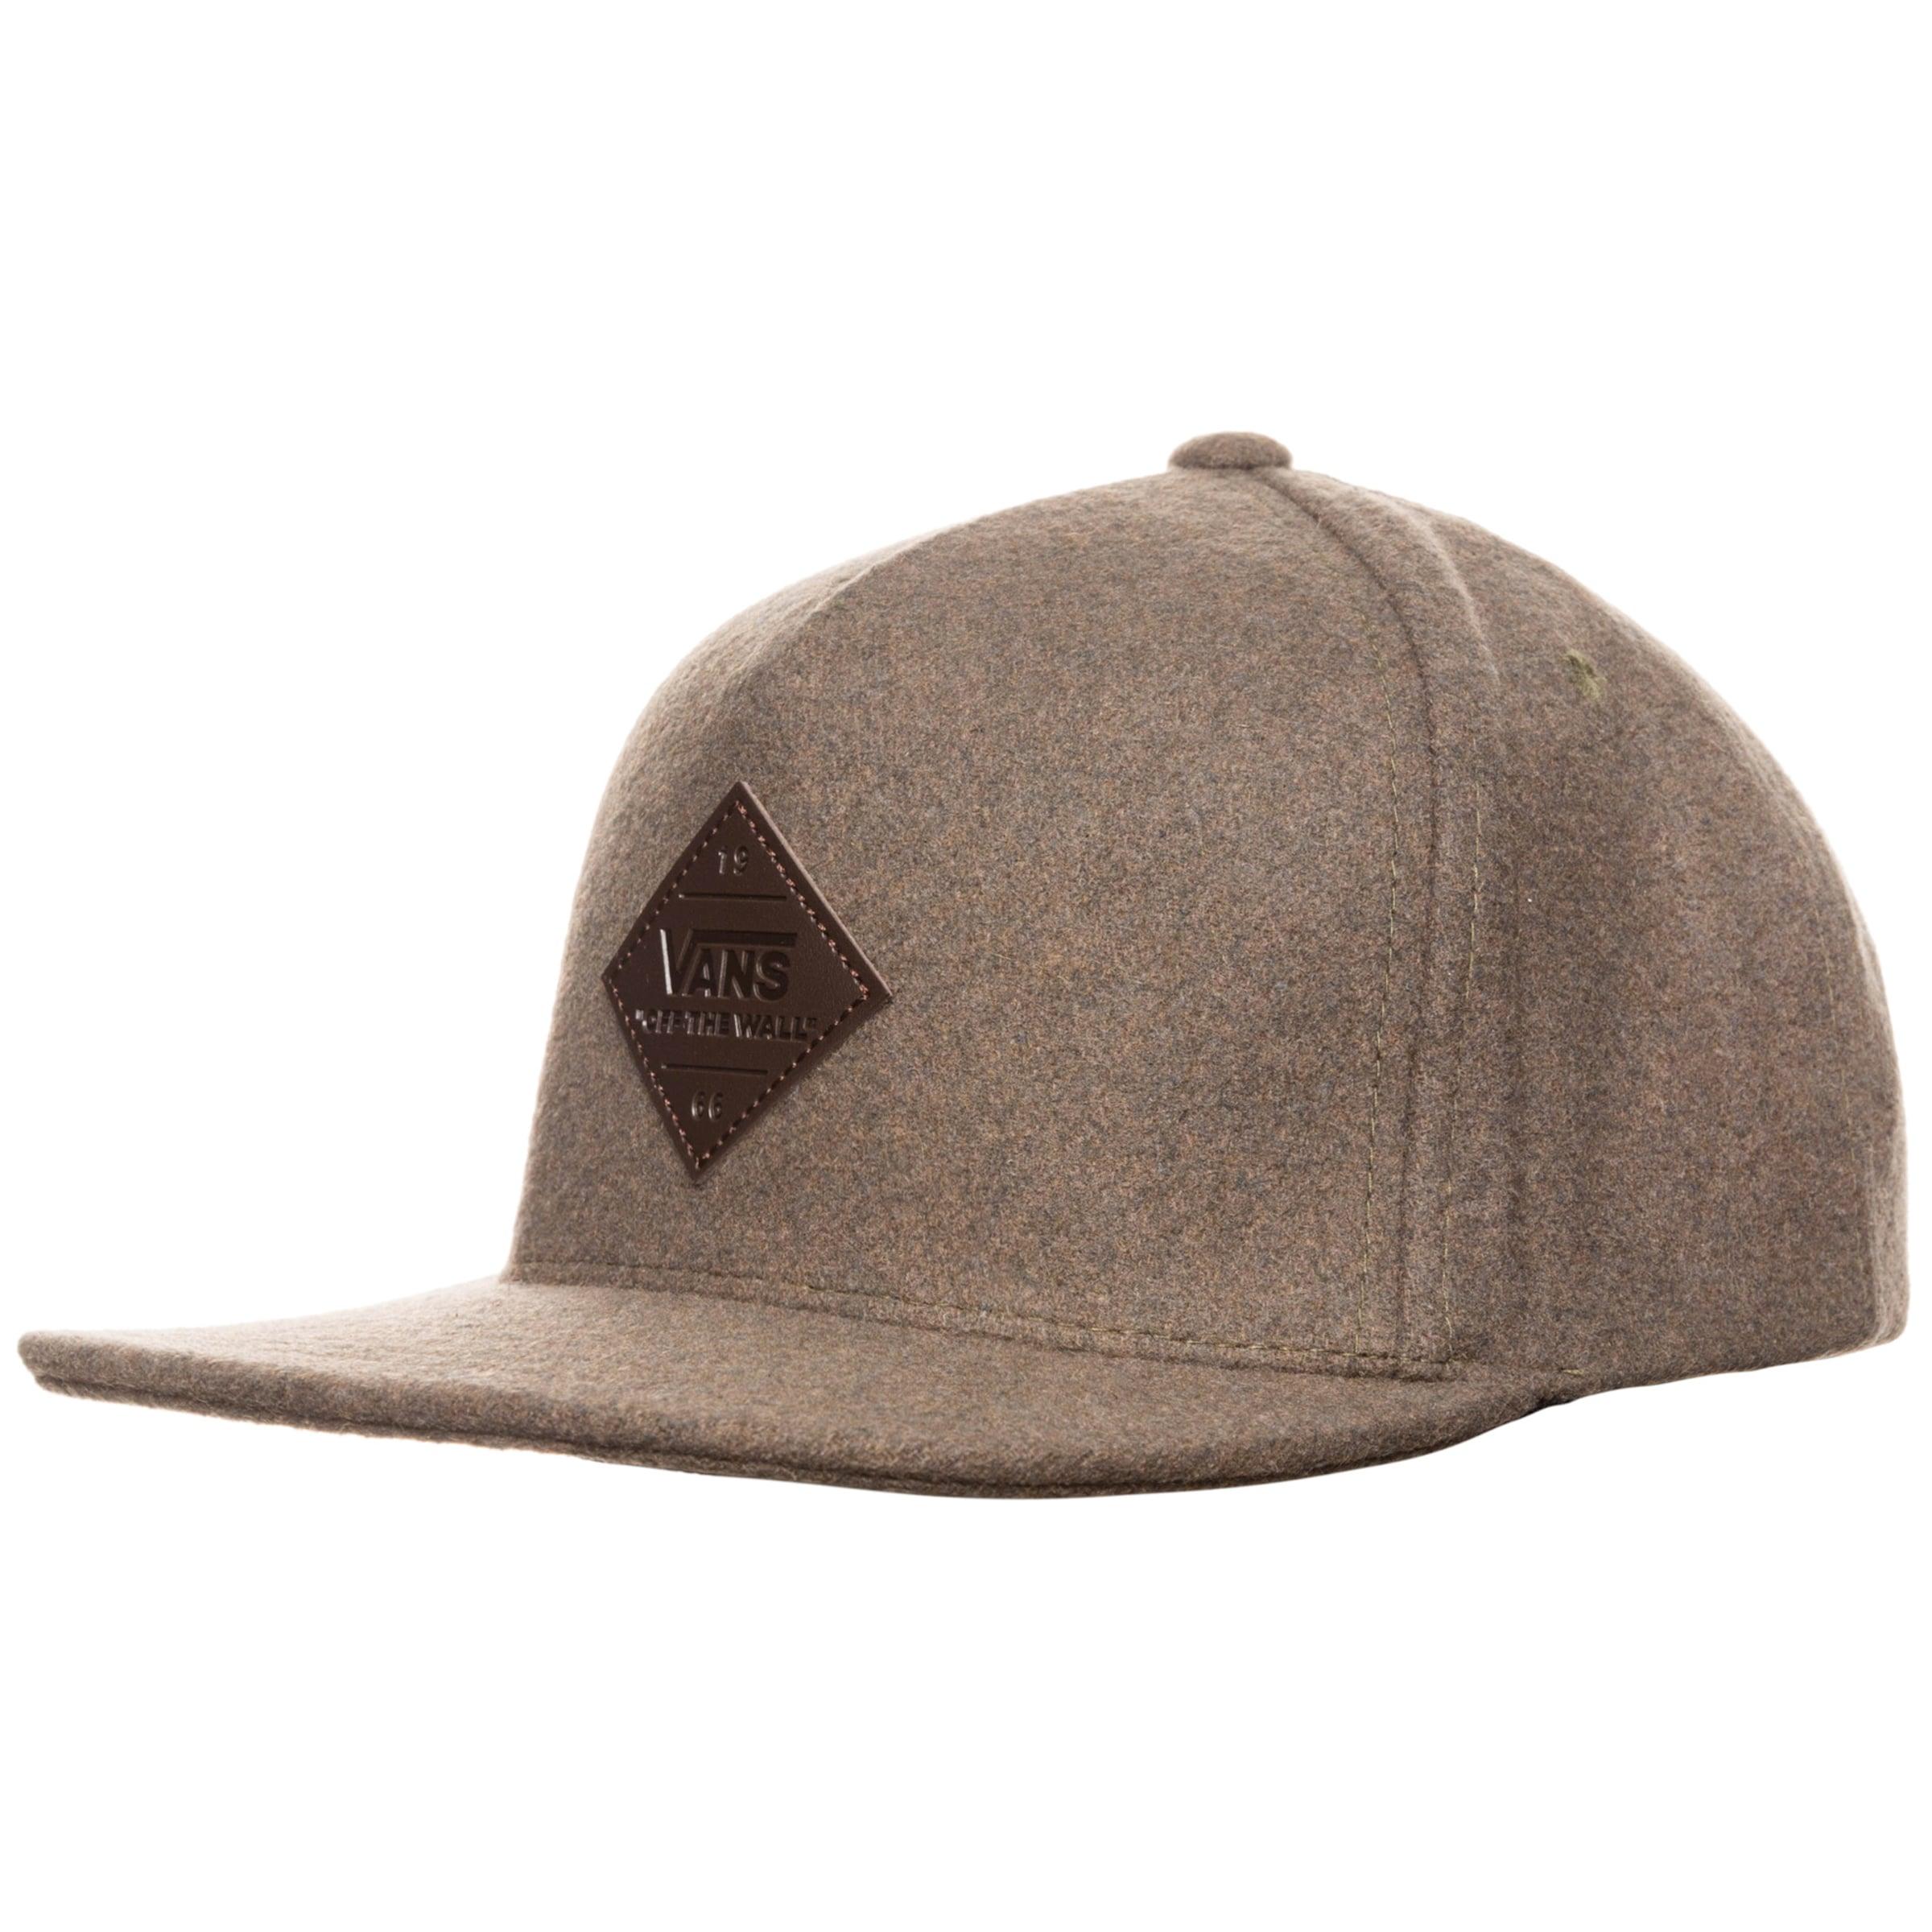 VANS 'Grove' Snapback Cap